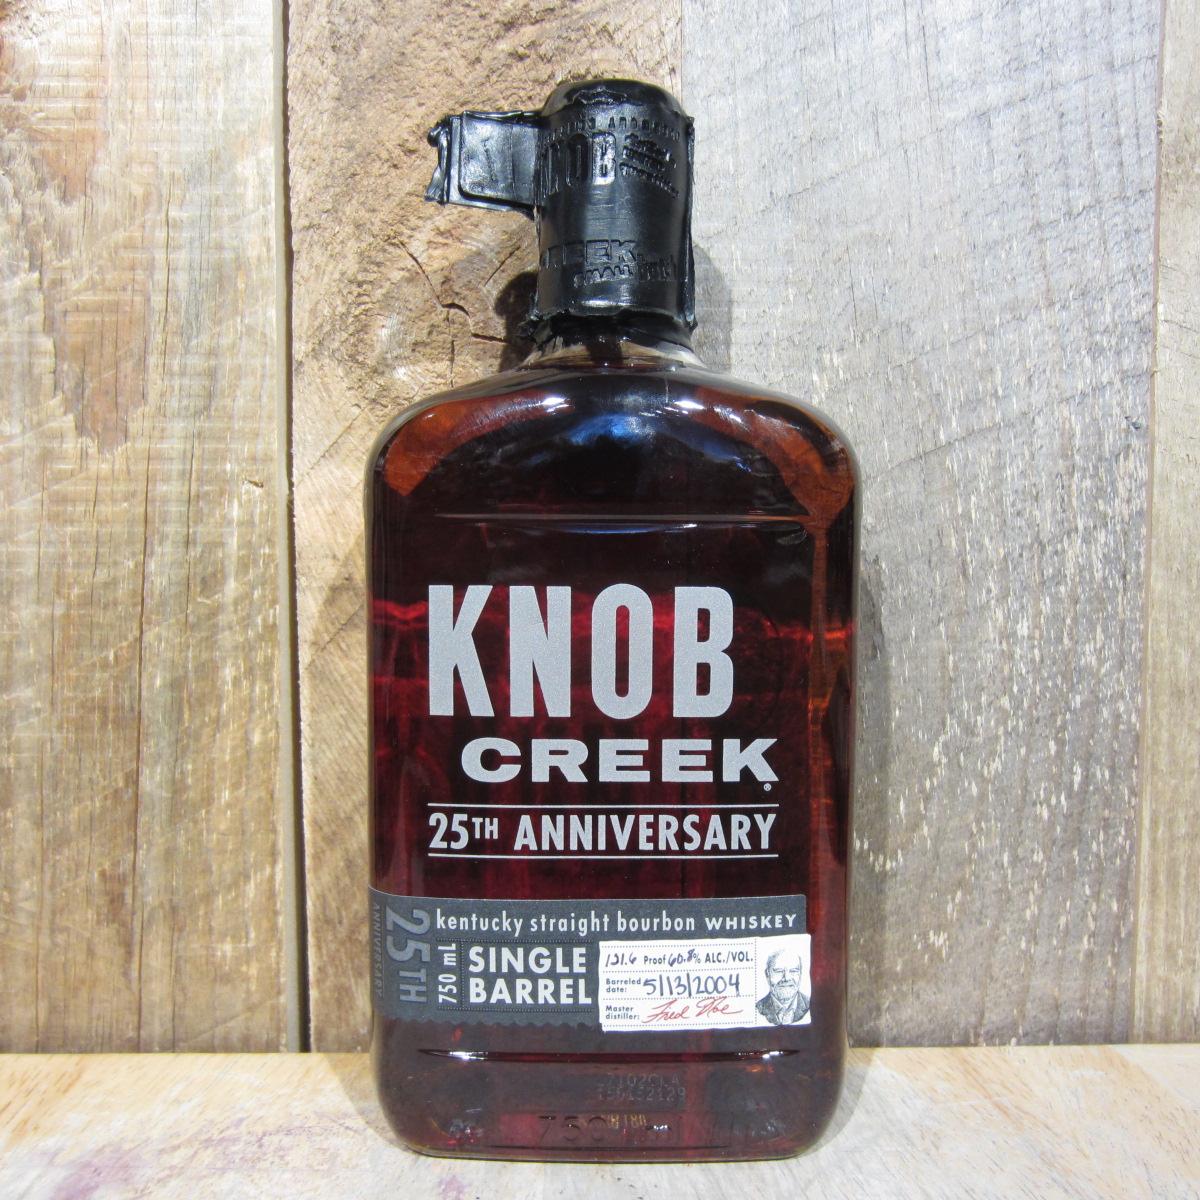 Knob Creek Bourbon Single Barrel 25th Anniversary 750ml